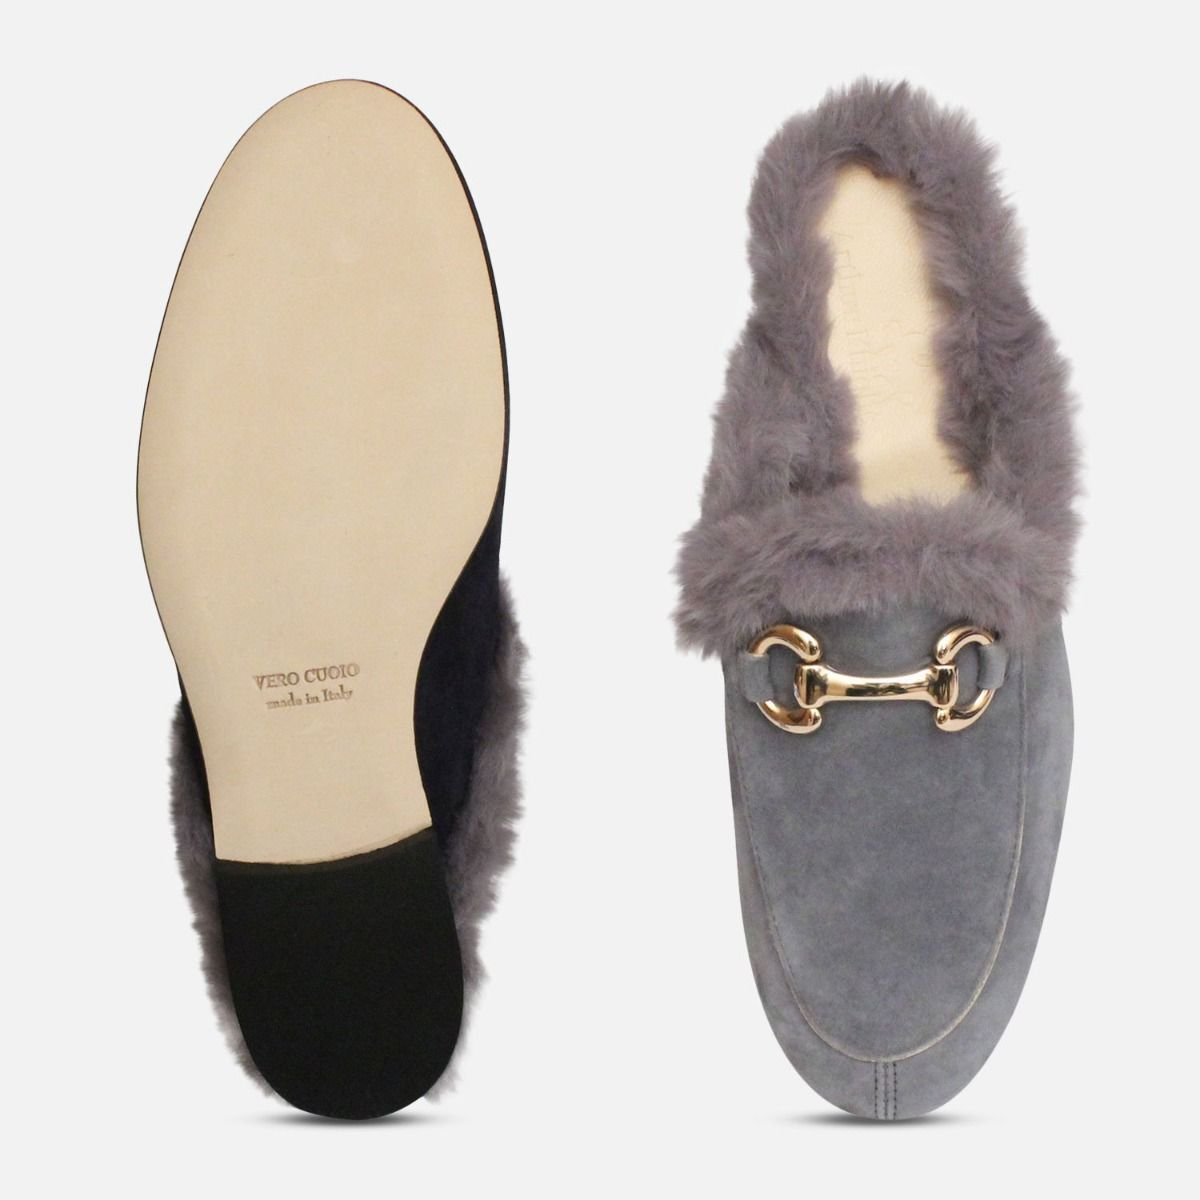 Grey Velvety Fur Slides by Arthur Knight Shoes